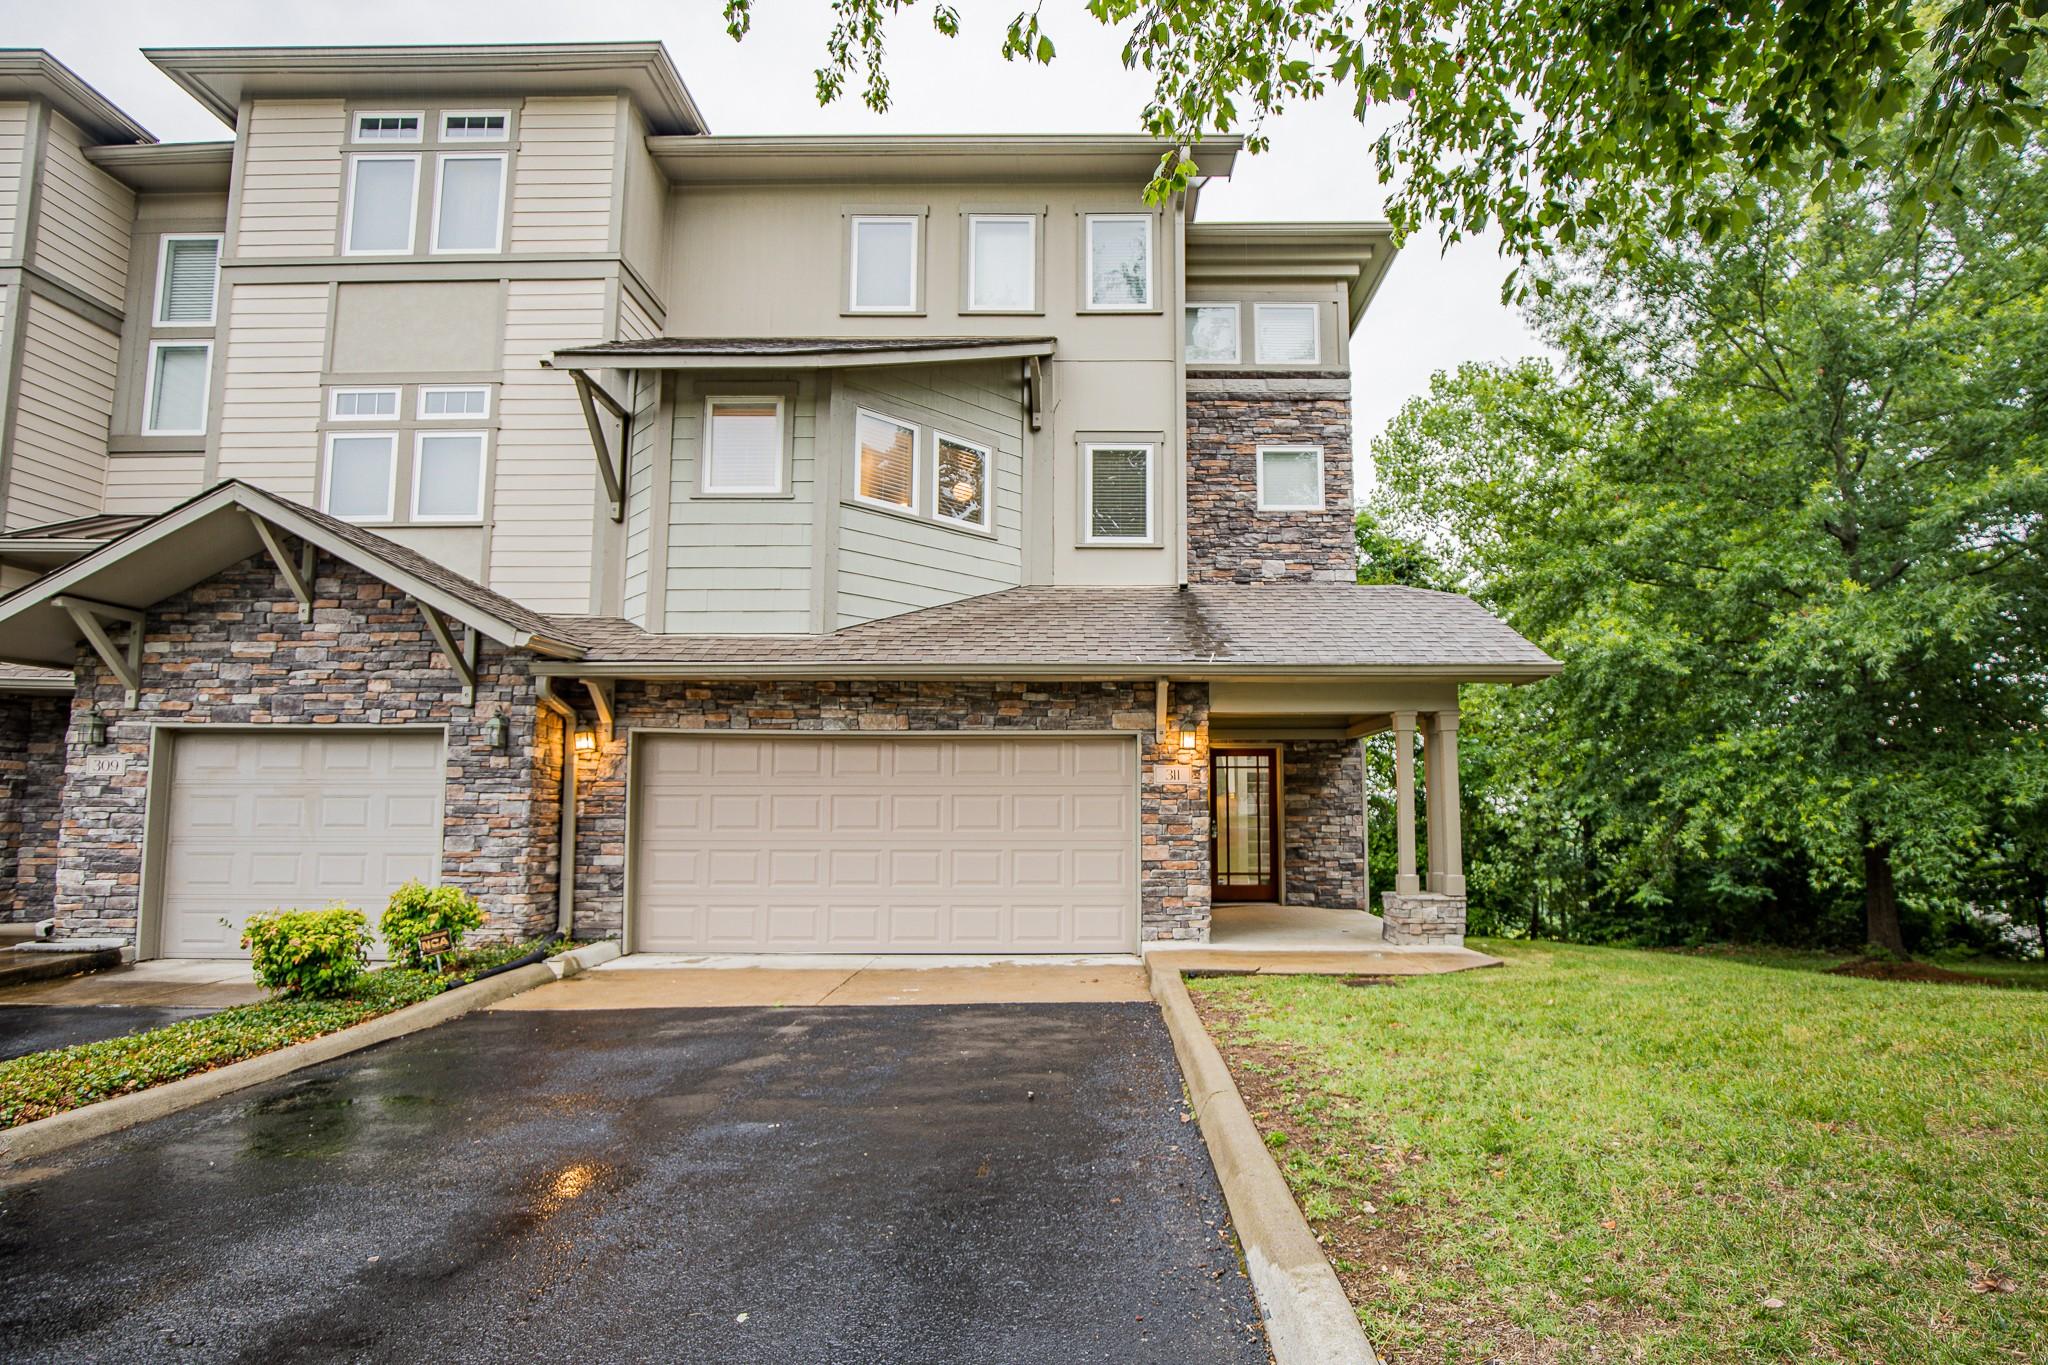 320 Old Hickory Blvd Property Photo - Nashville, TN real estate listing